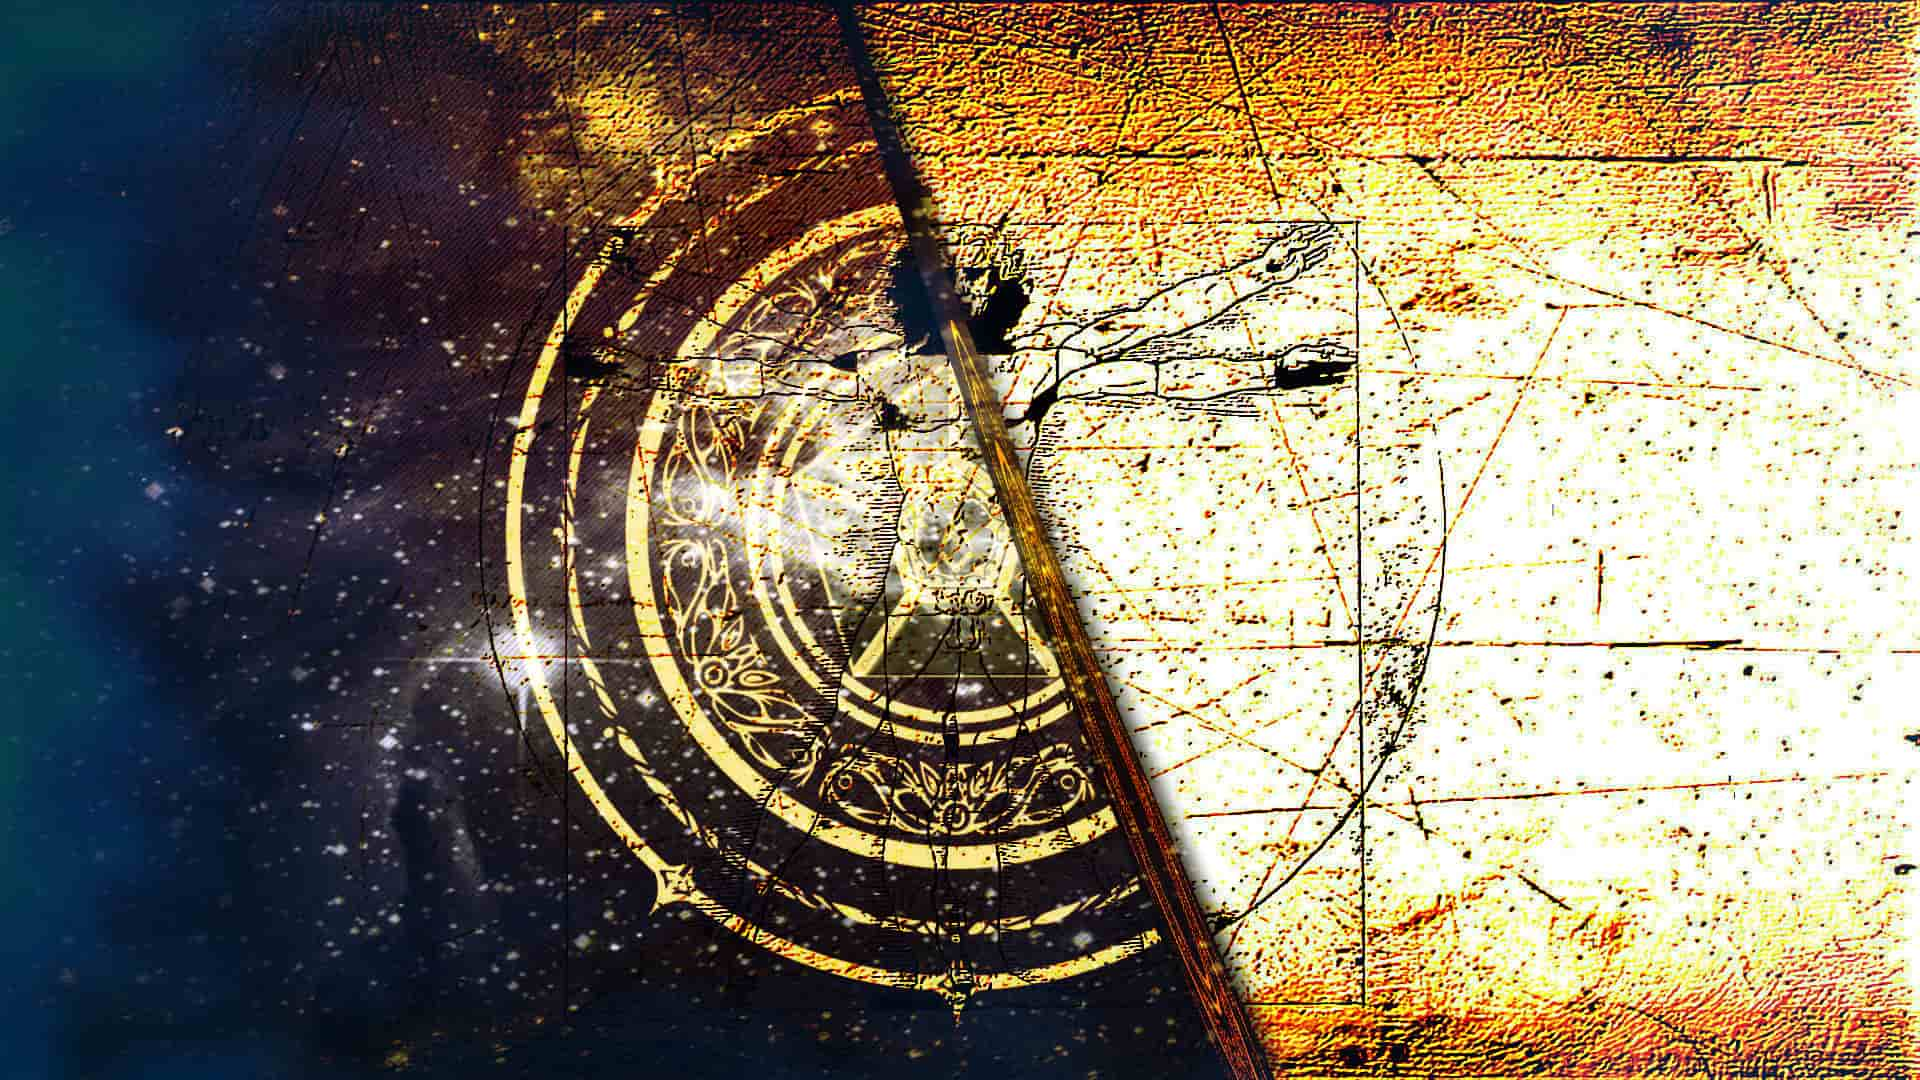 MCT-Vitruvian-Man-1717-token | My Freemasonry | Freemason ...